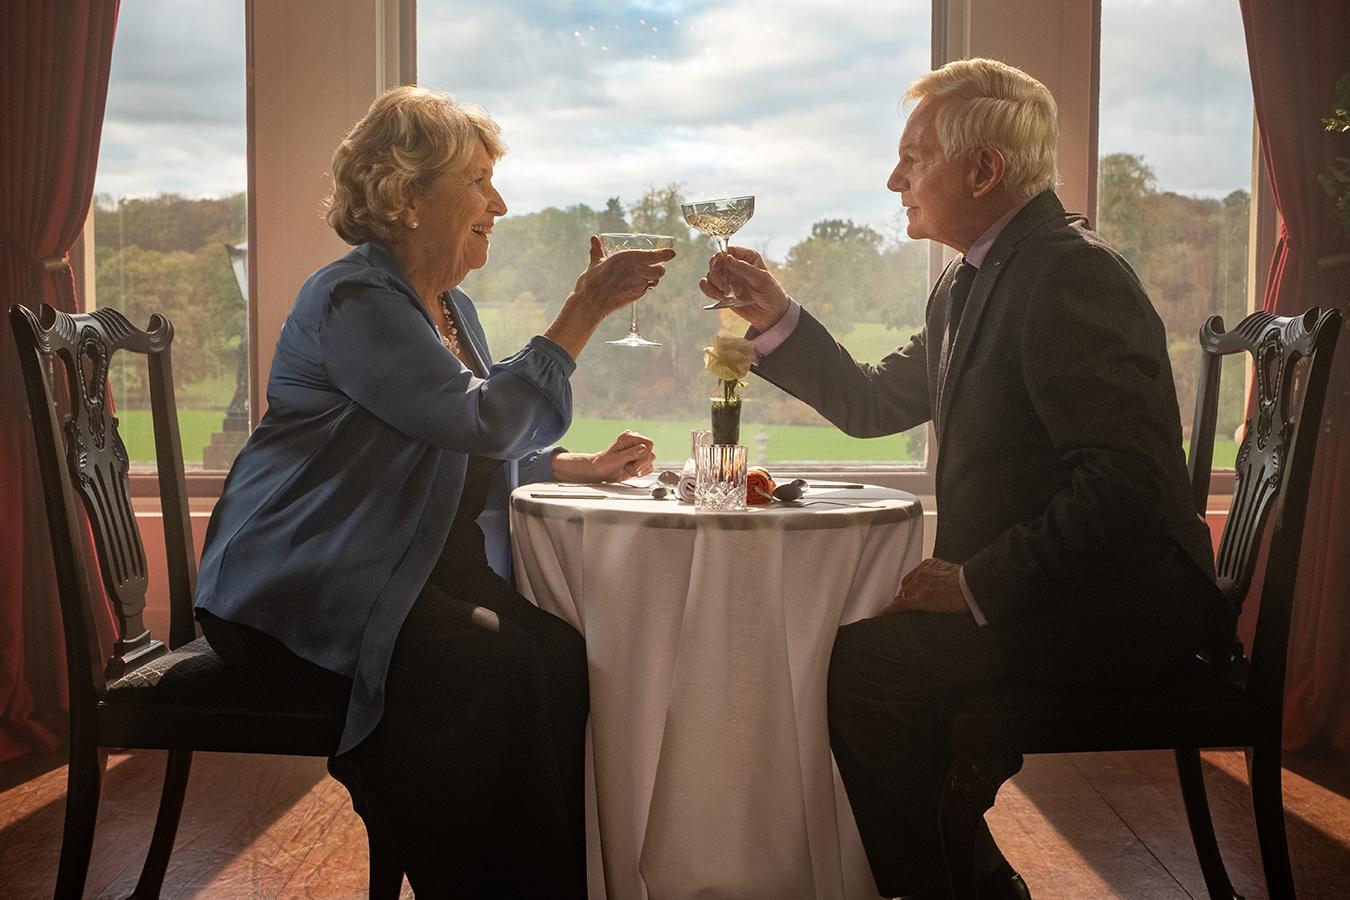 Last Tango in Halifax returns with Celia and Alan